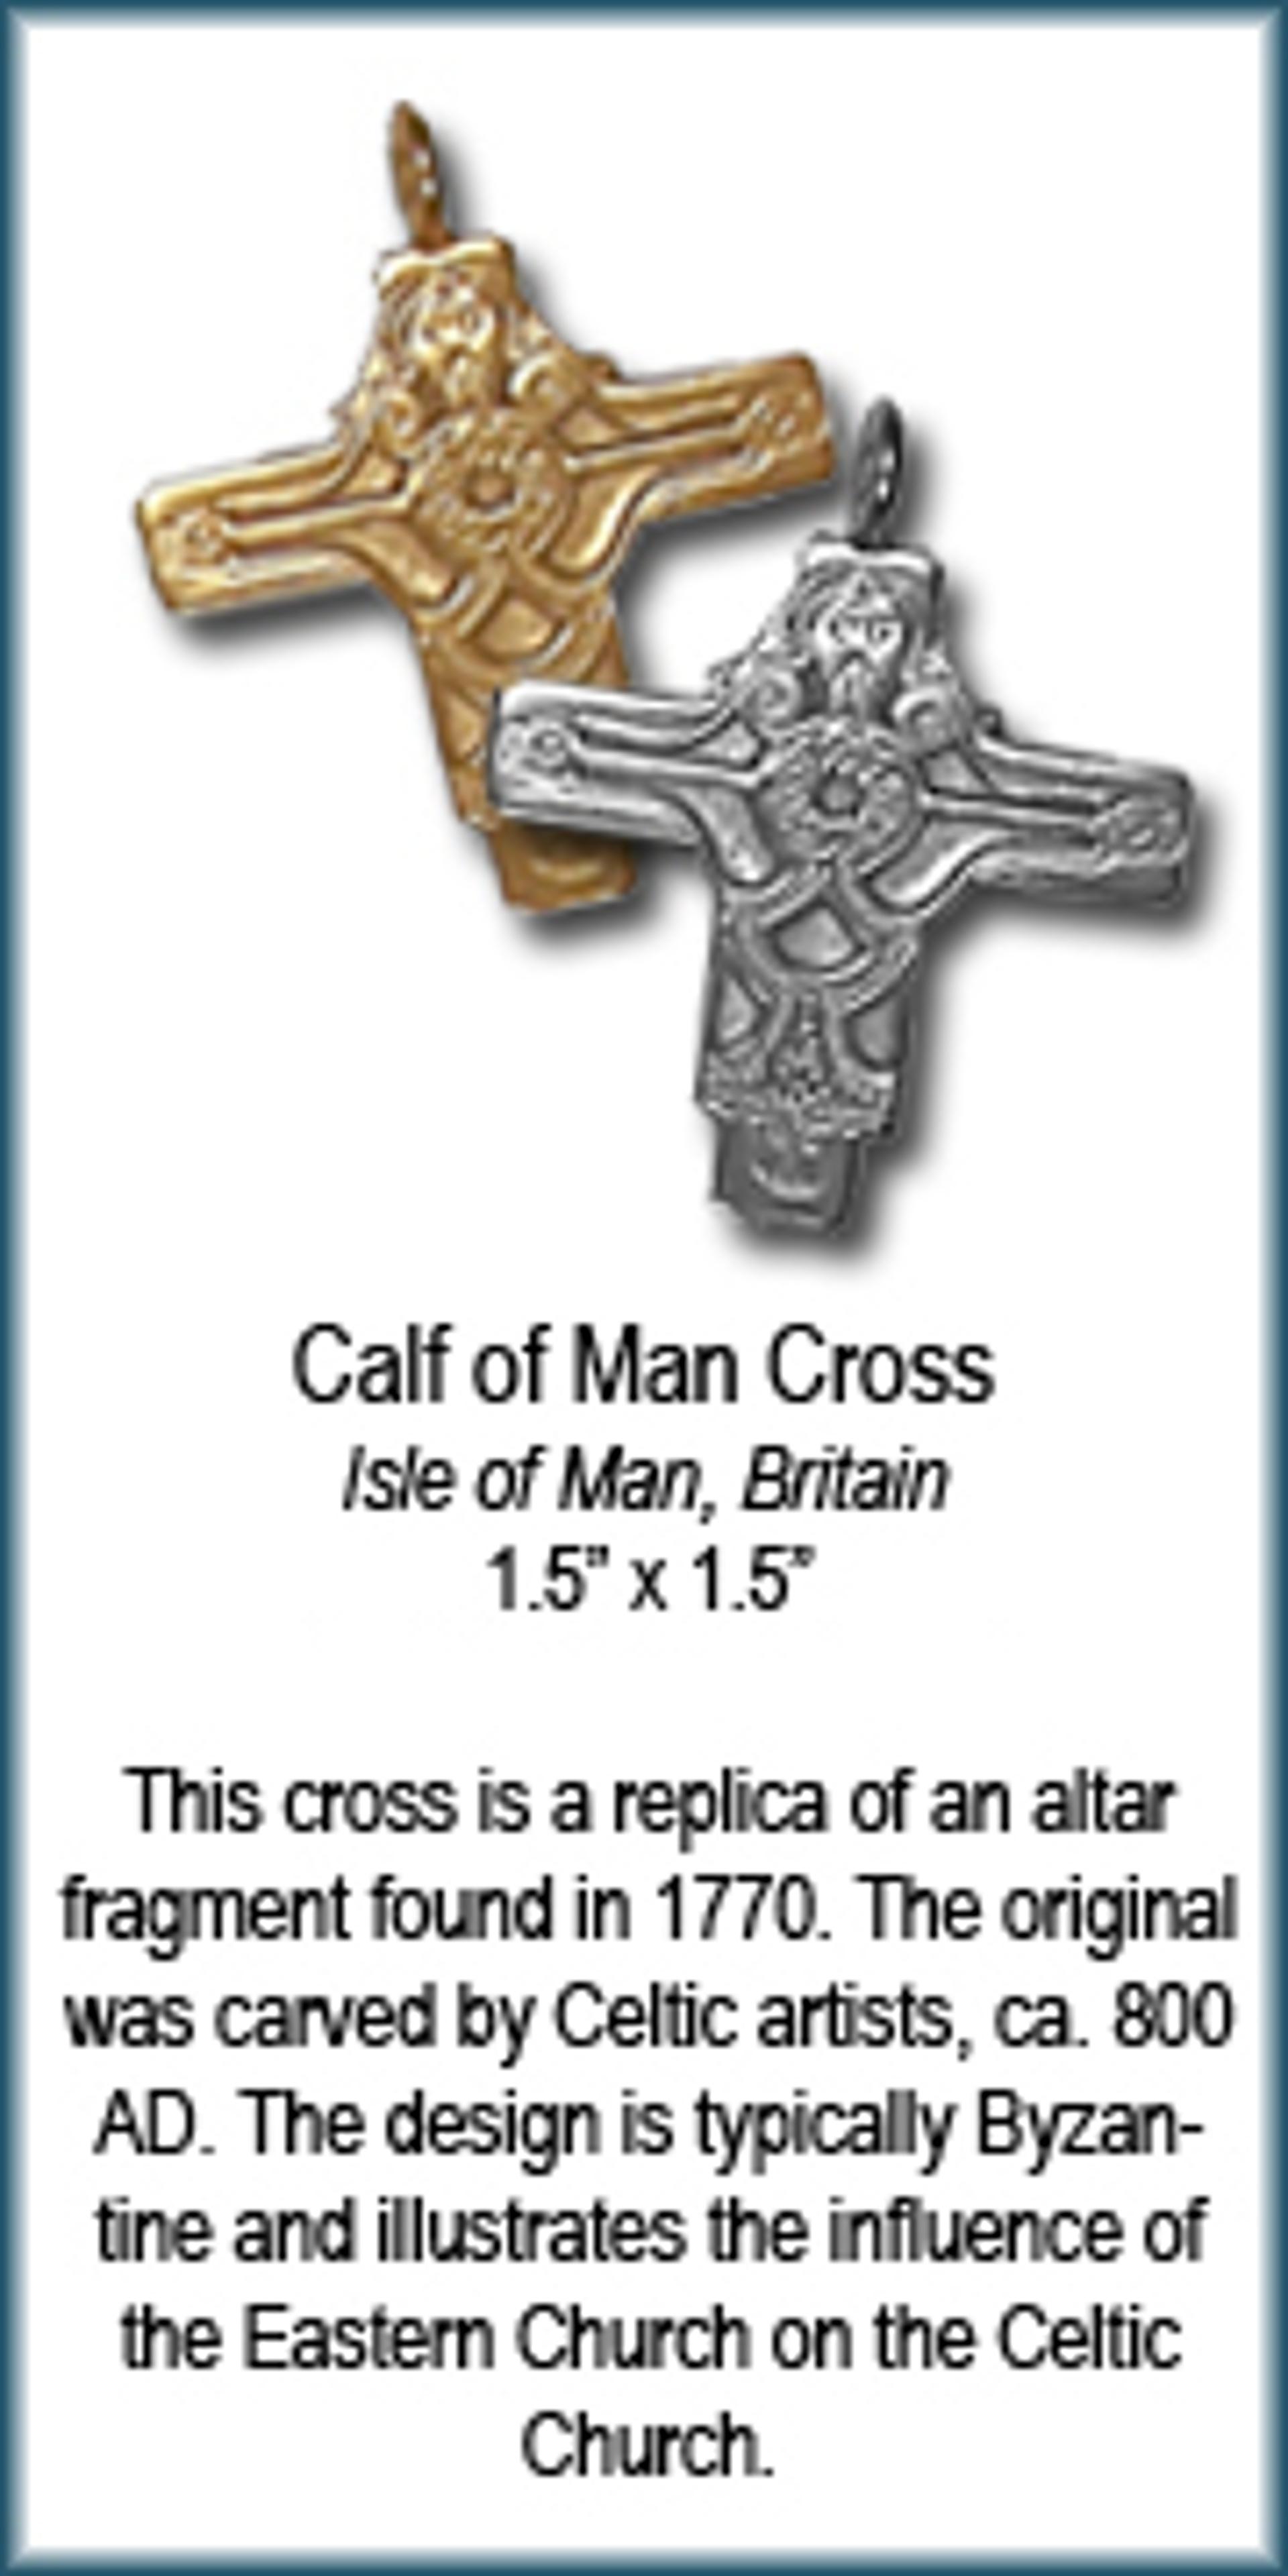 Pendant - Calf Of Man Cross - 7566 by Deanne McKeown